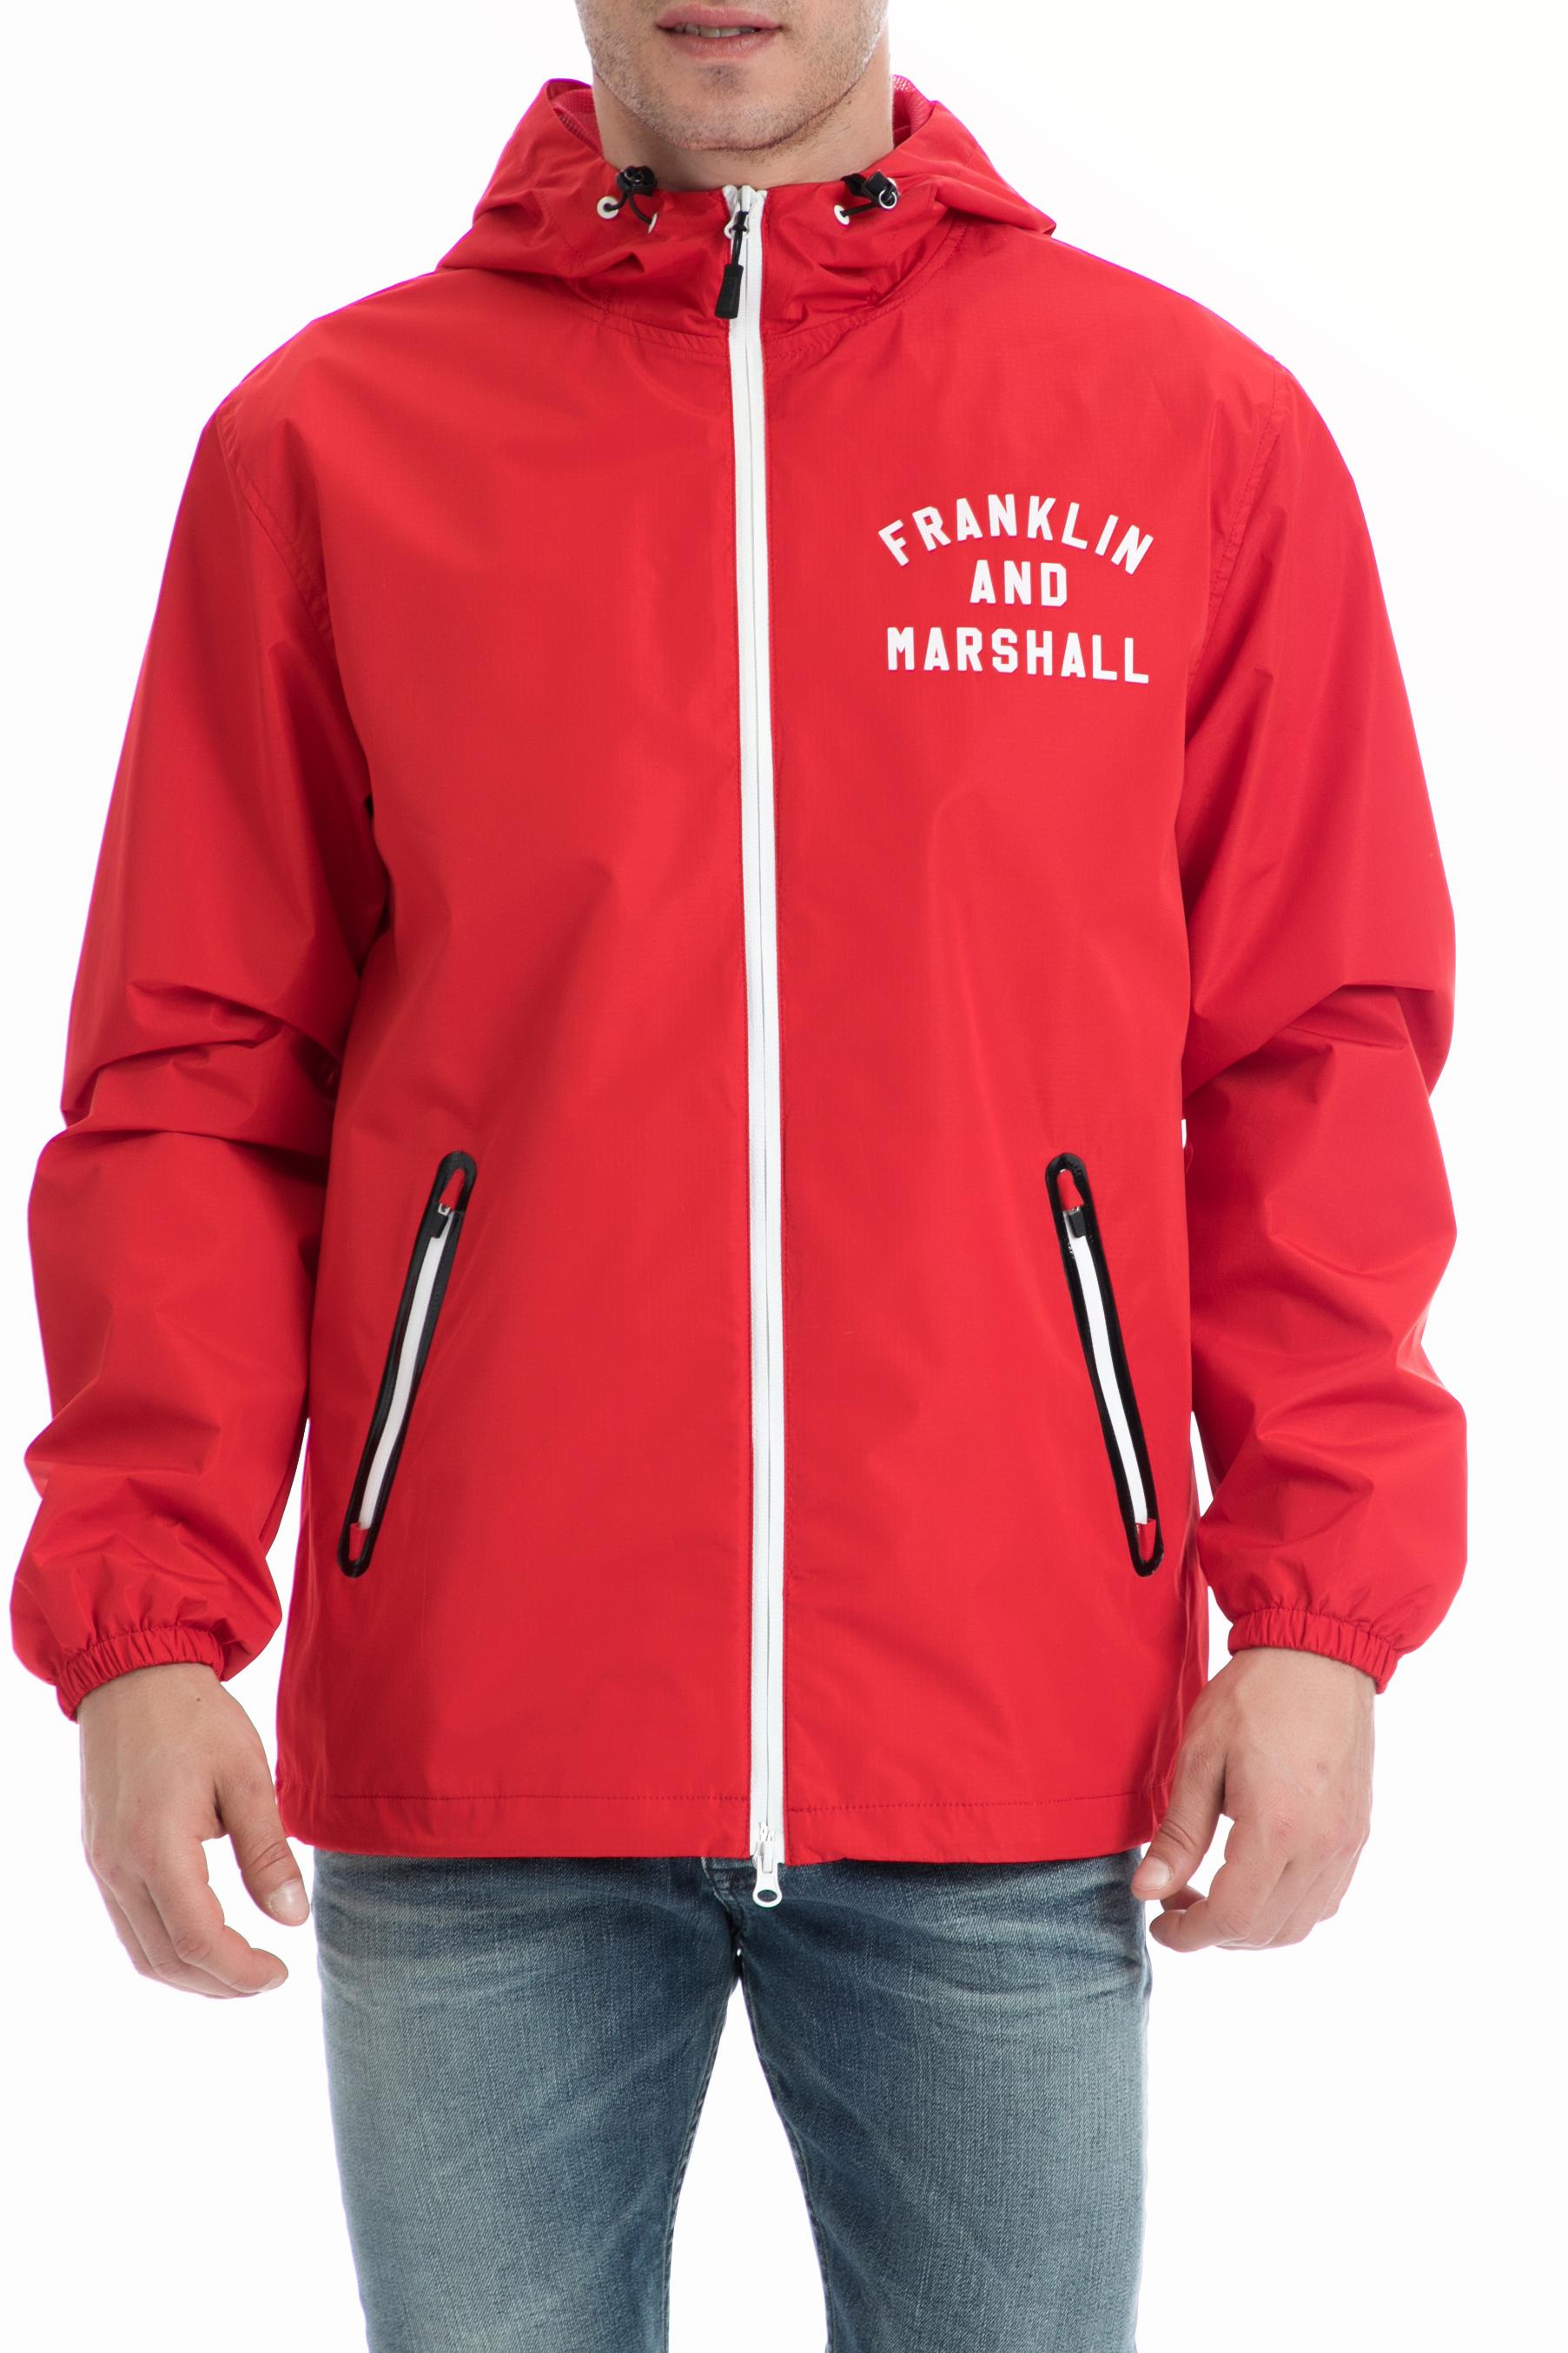 FRANKLIN & MARSHALL – Ανδρικό τζάκετ Franklin & Marshall κόκκινο